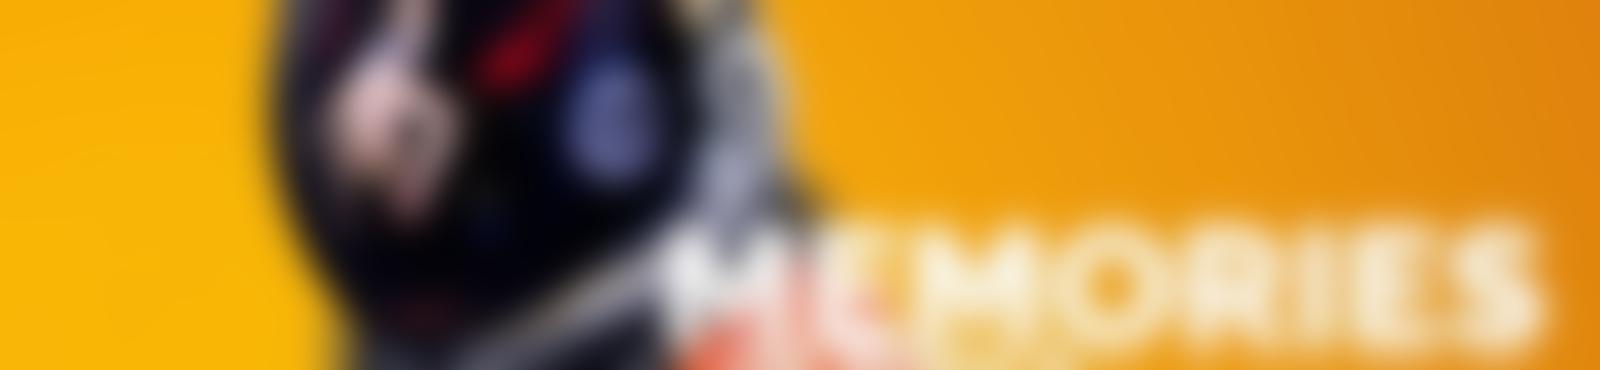 Blurred baab406e 94dd 4733 8db3 e636f9a01670